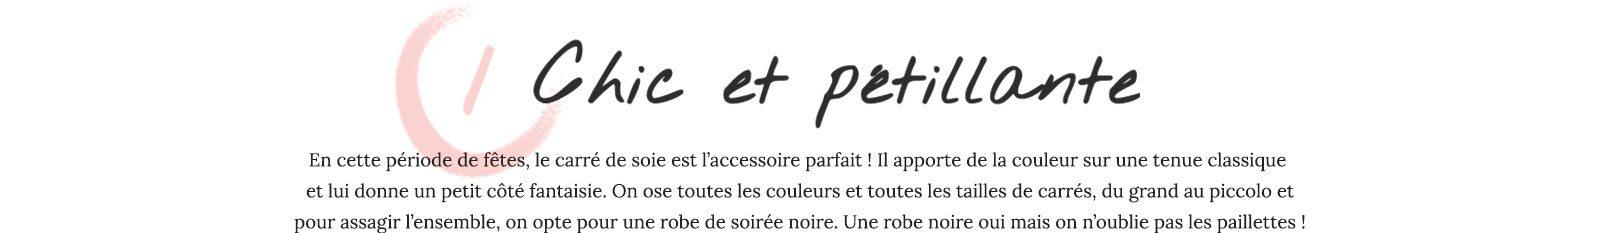 http://chantier.allee-du-foulard.fr/wp-content/uploads/2017/12/0641-ADF-LB-lookfete-titre-chicetpetillante-1600x233.jpg